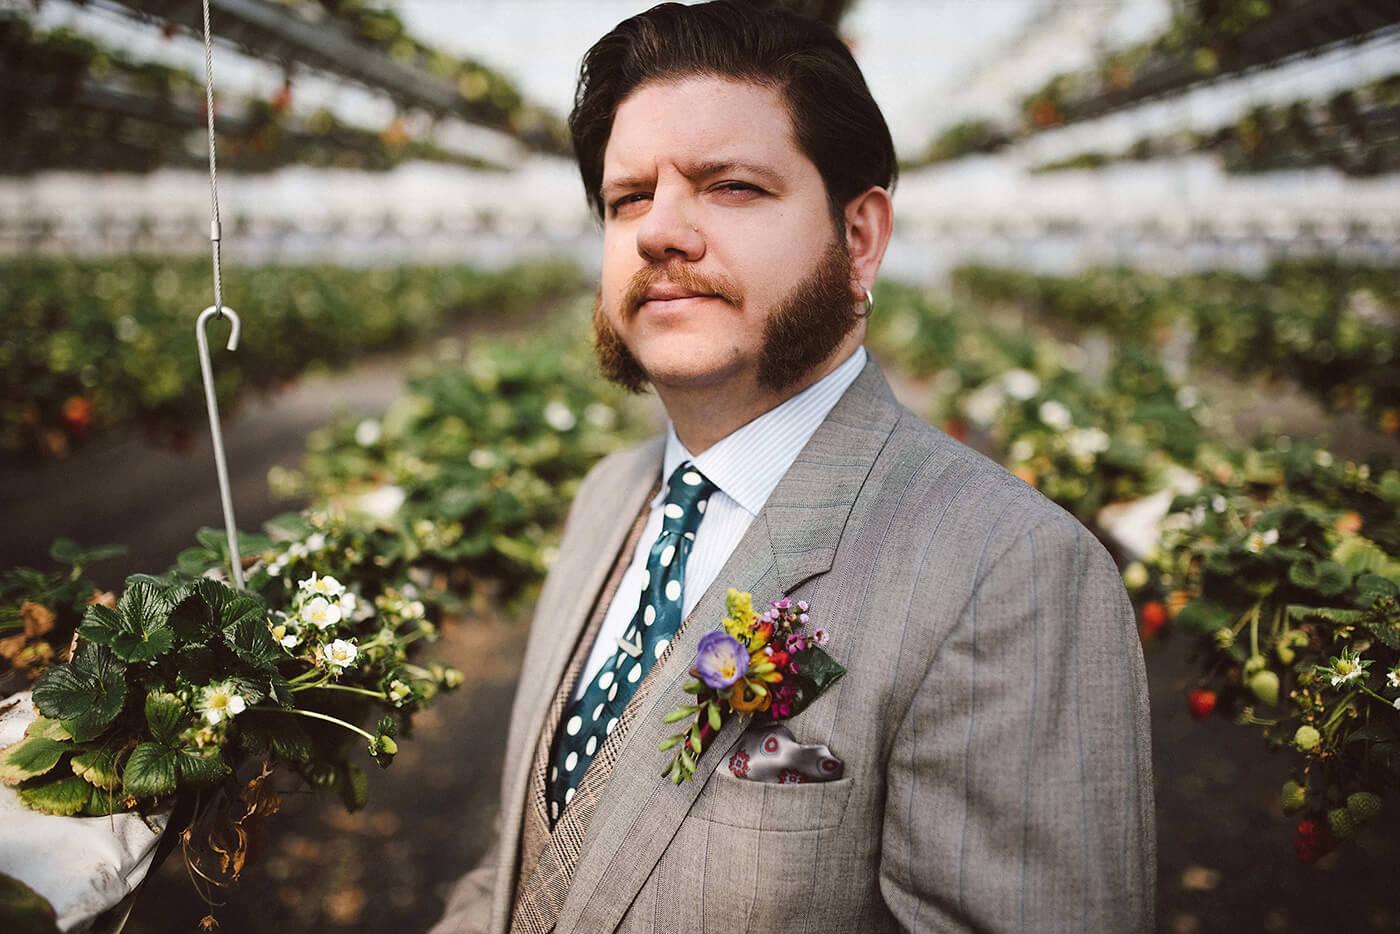 roma-organizacao-eventos-editorial-mid-century-modern-wedding-in-a-strawberry-field-11